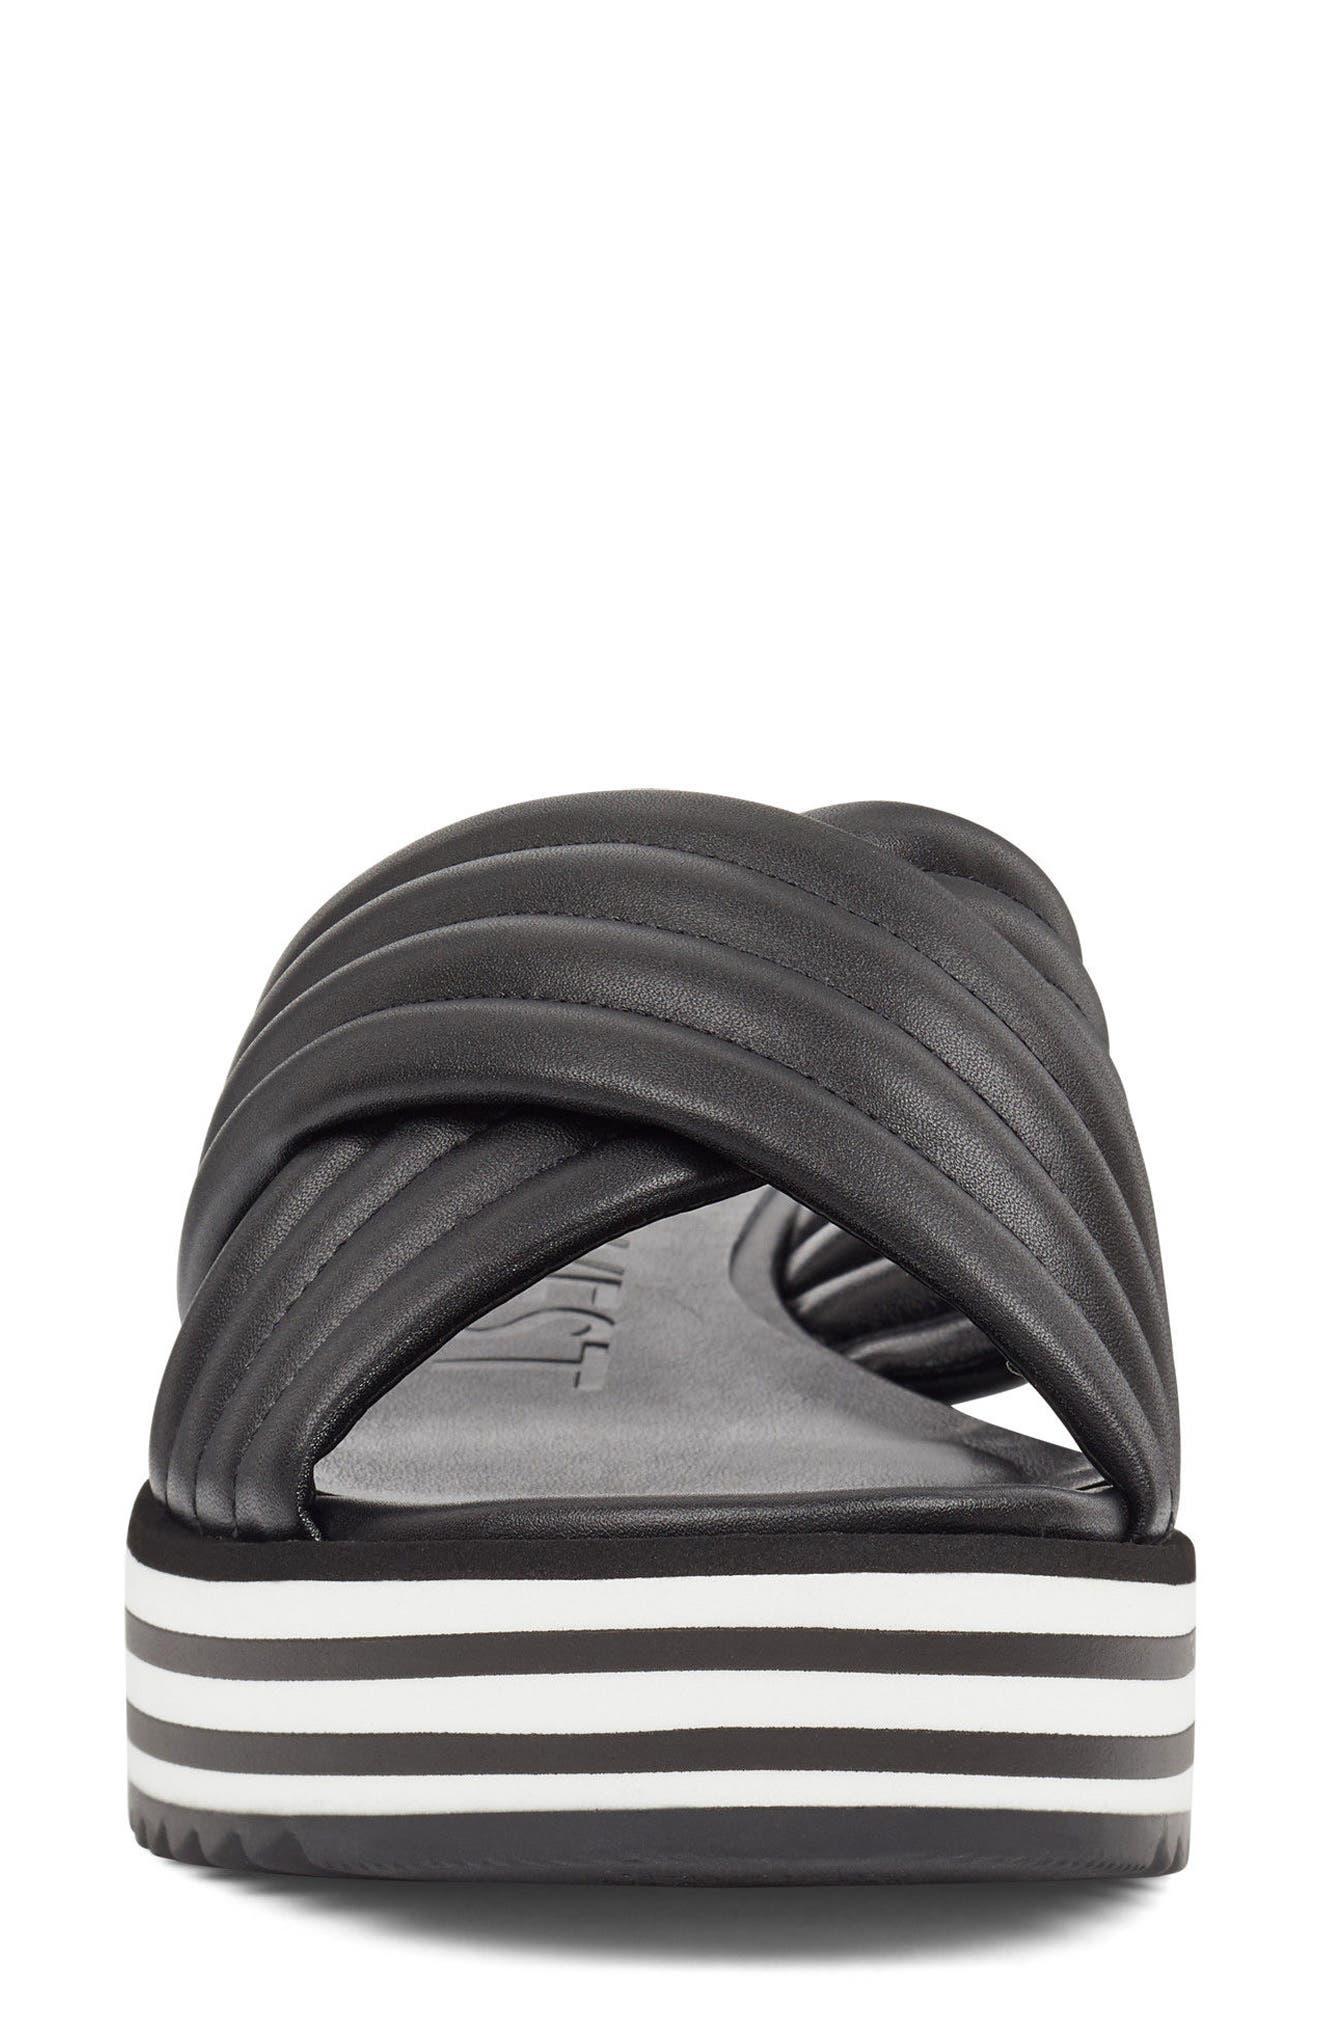 Zonita Platform Slide Sandal,                             Alternate thumbnail 10, color,